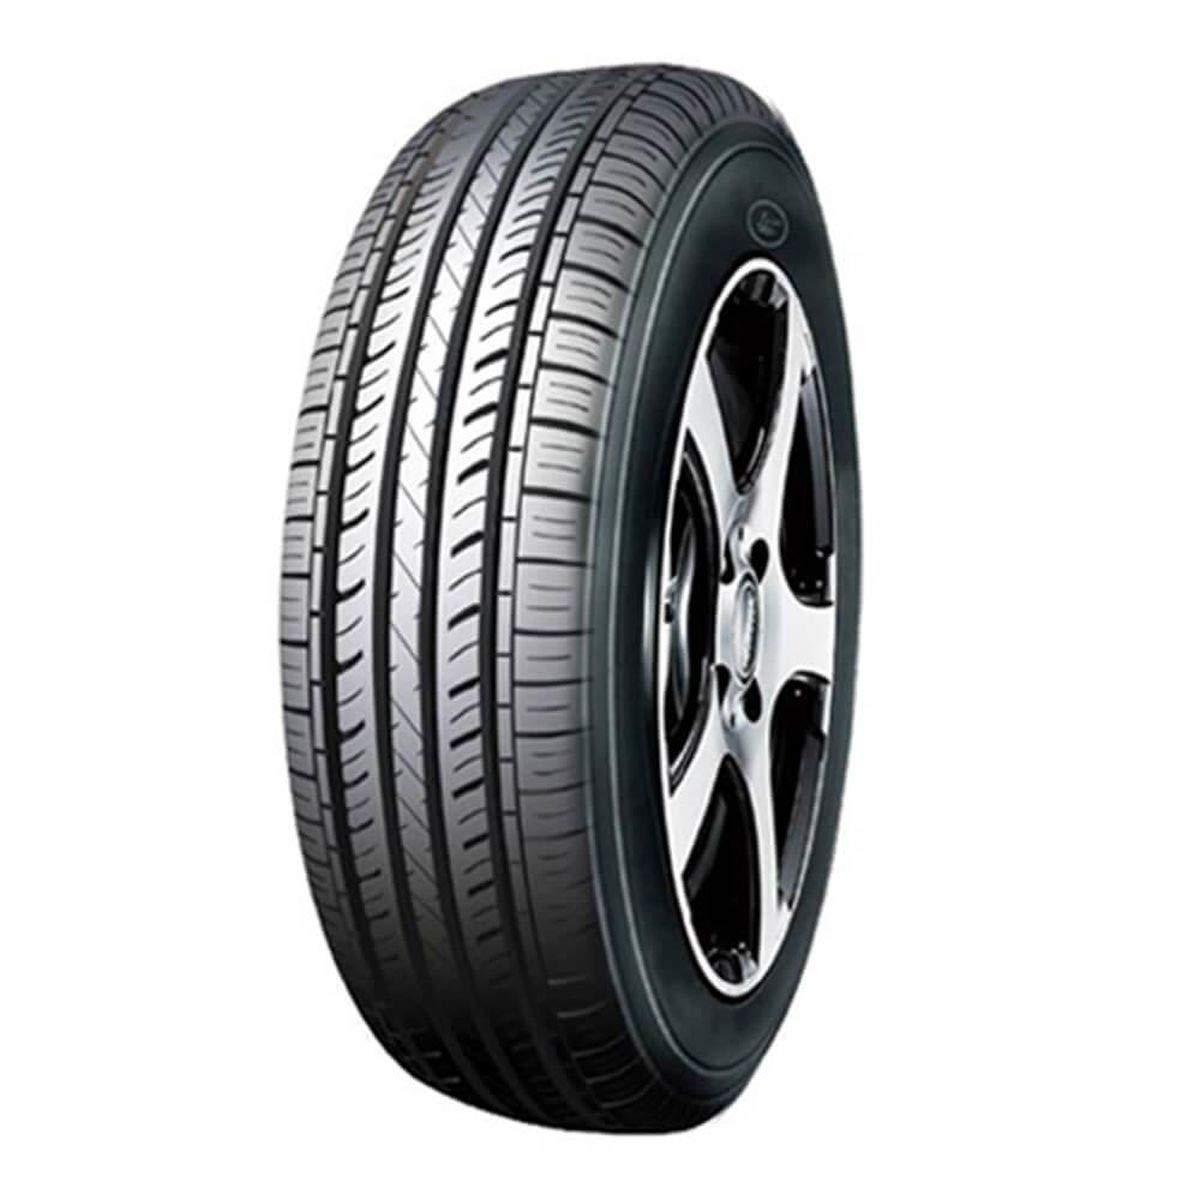 Linglong Crosswind Tires >> Ling Long Crosswind Eco Touring 215 75 R15 98w Tubeless Car